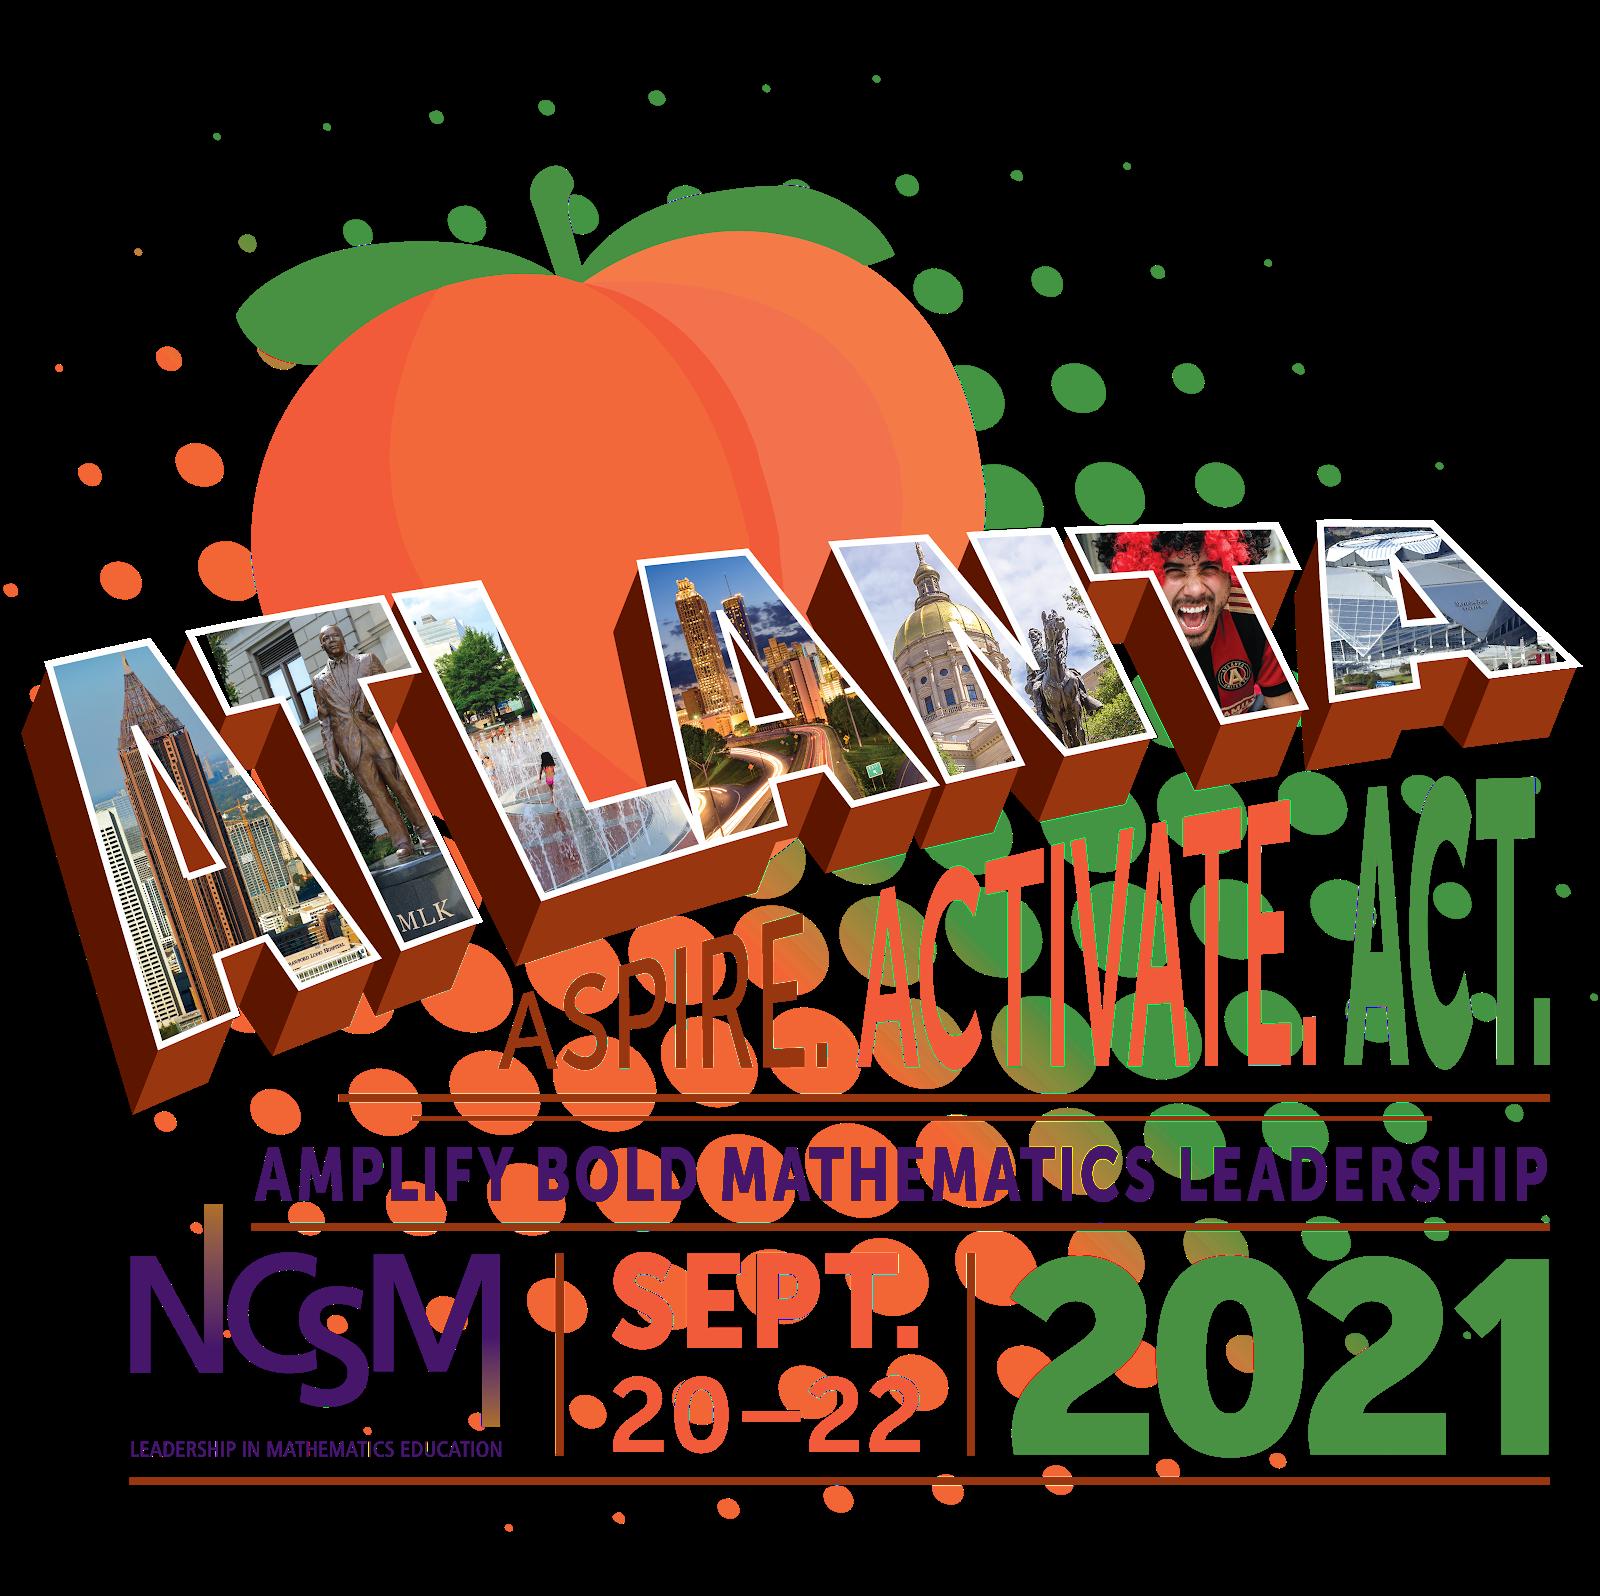 2021 Atlanta Logo